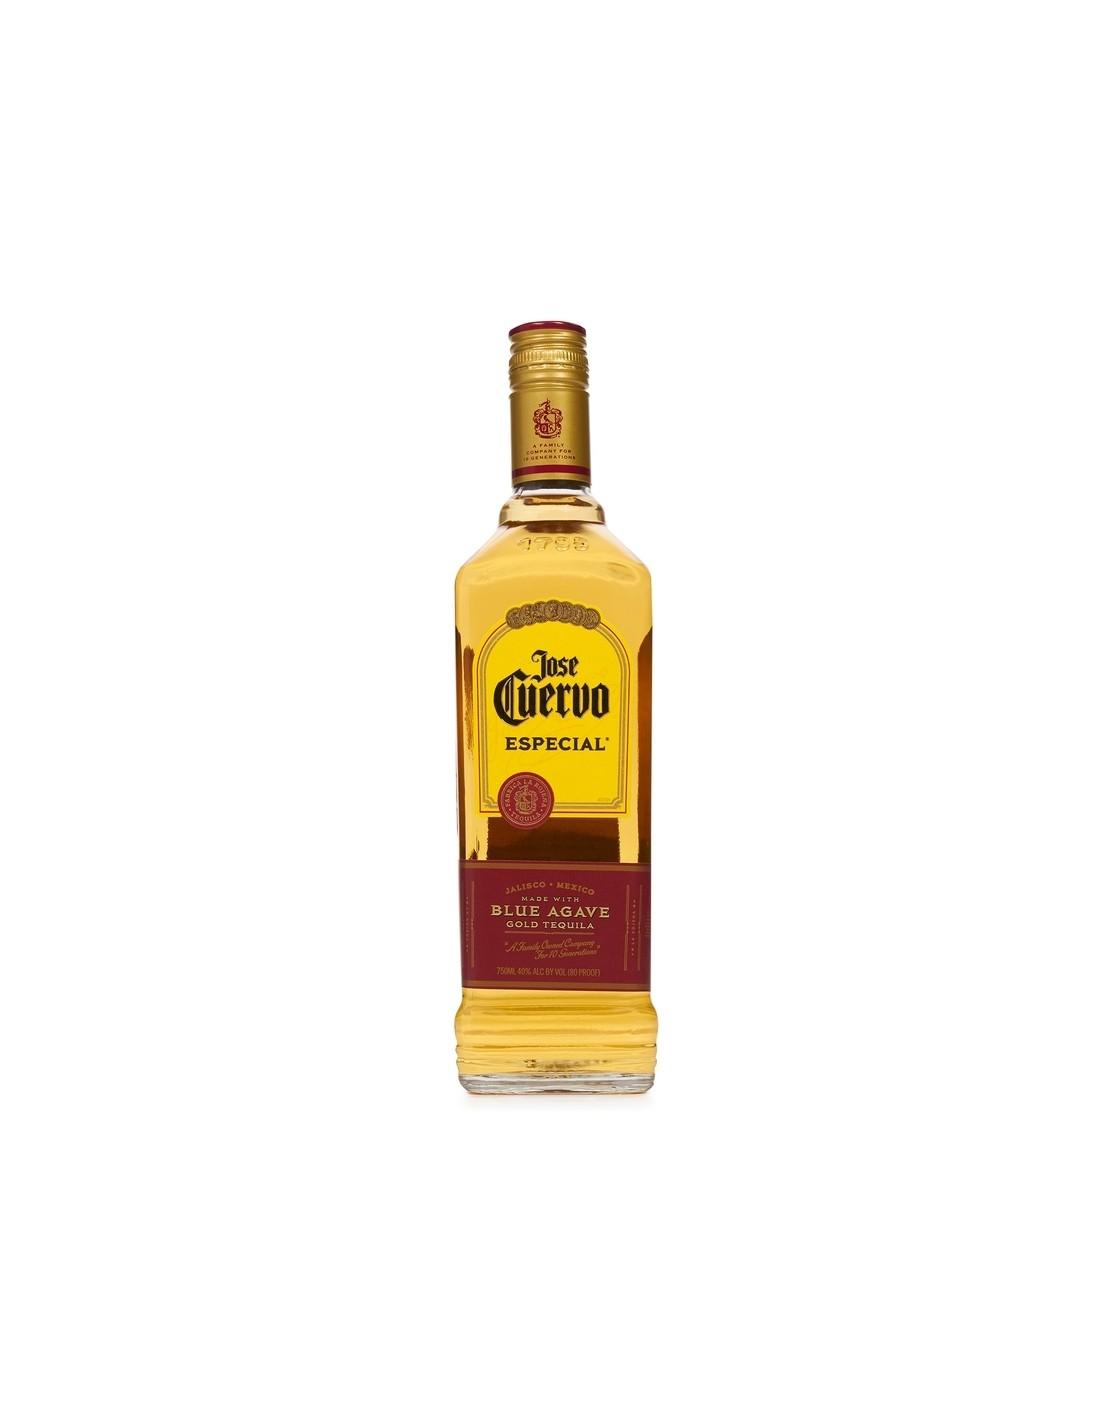 Tequila aurie Jose Cuervo Especial Reposado 0.7L, 38% alc., Mexic